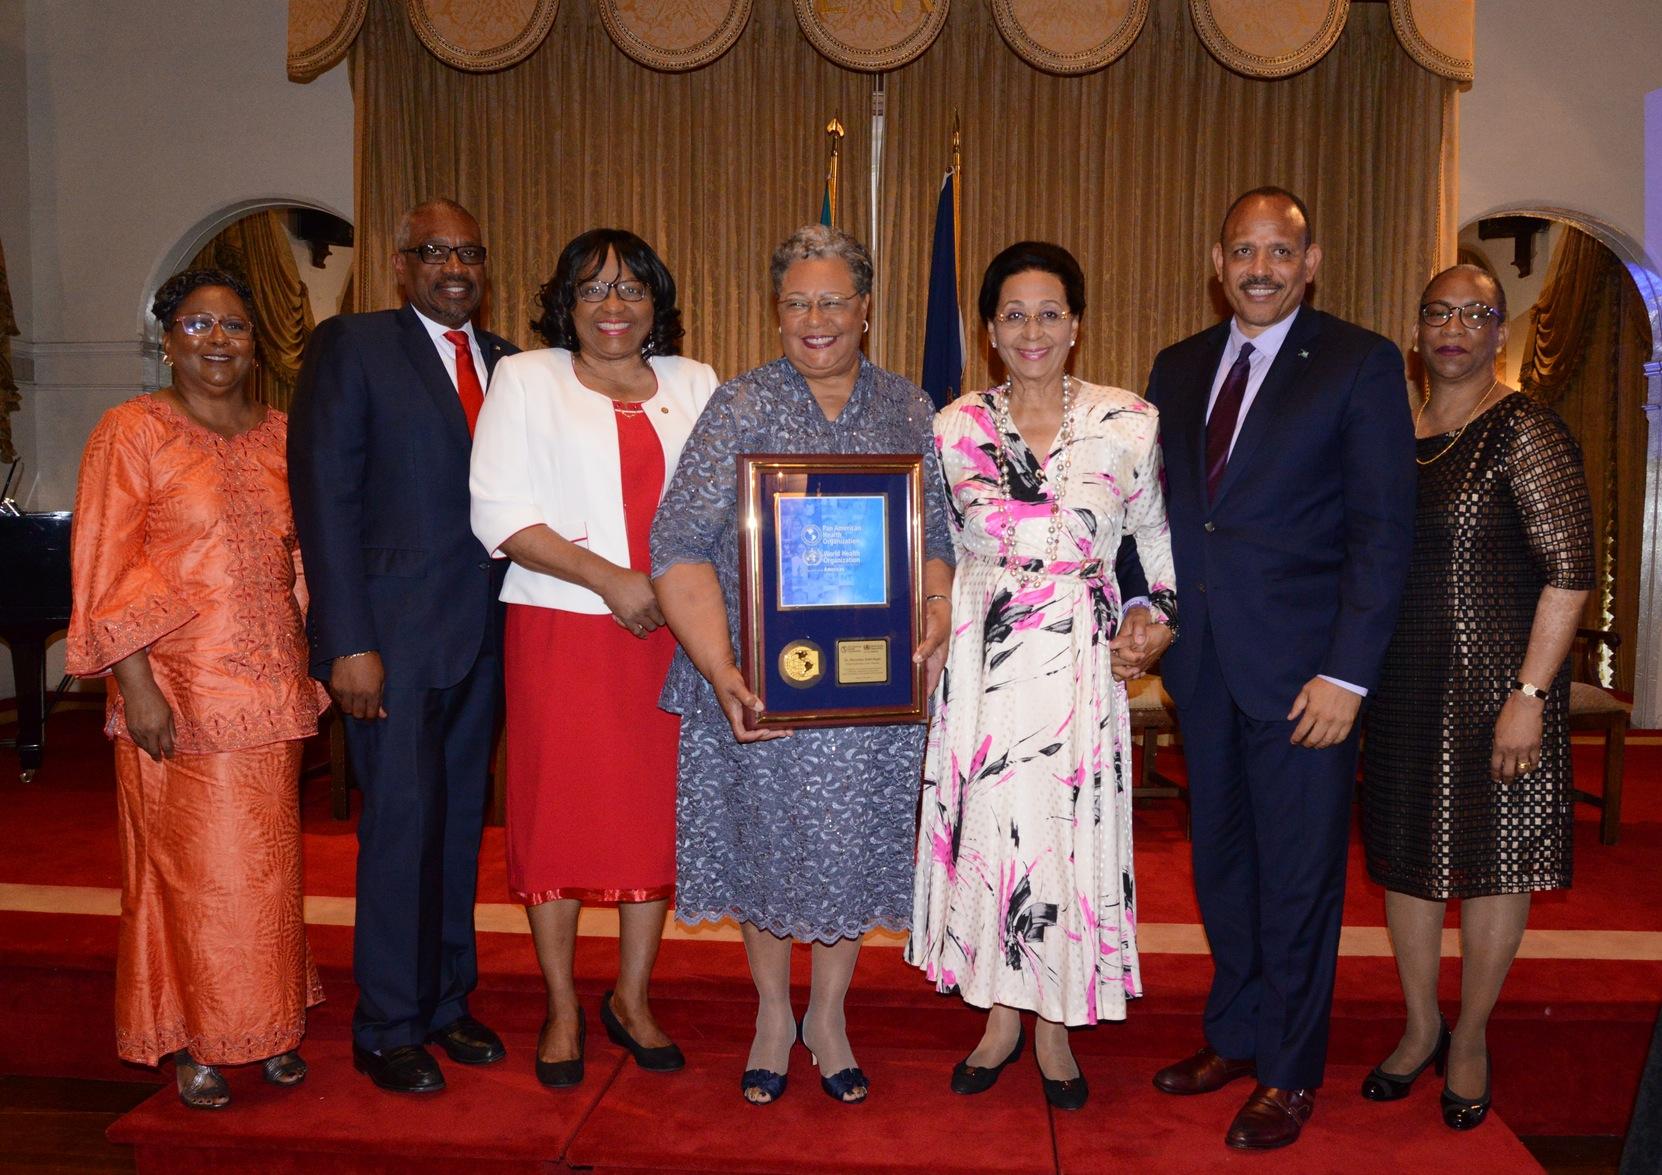 PM applauds Dr. Dahl-Regis on international recognition